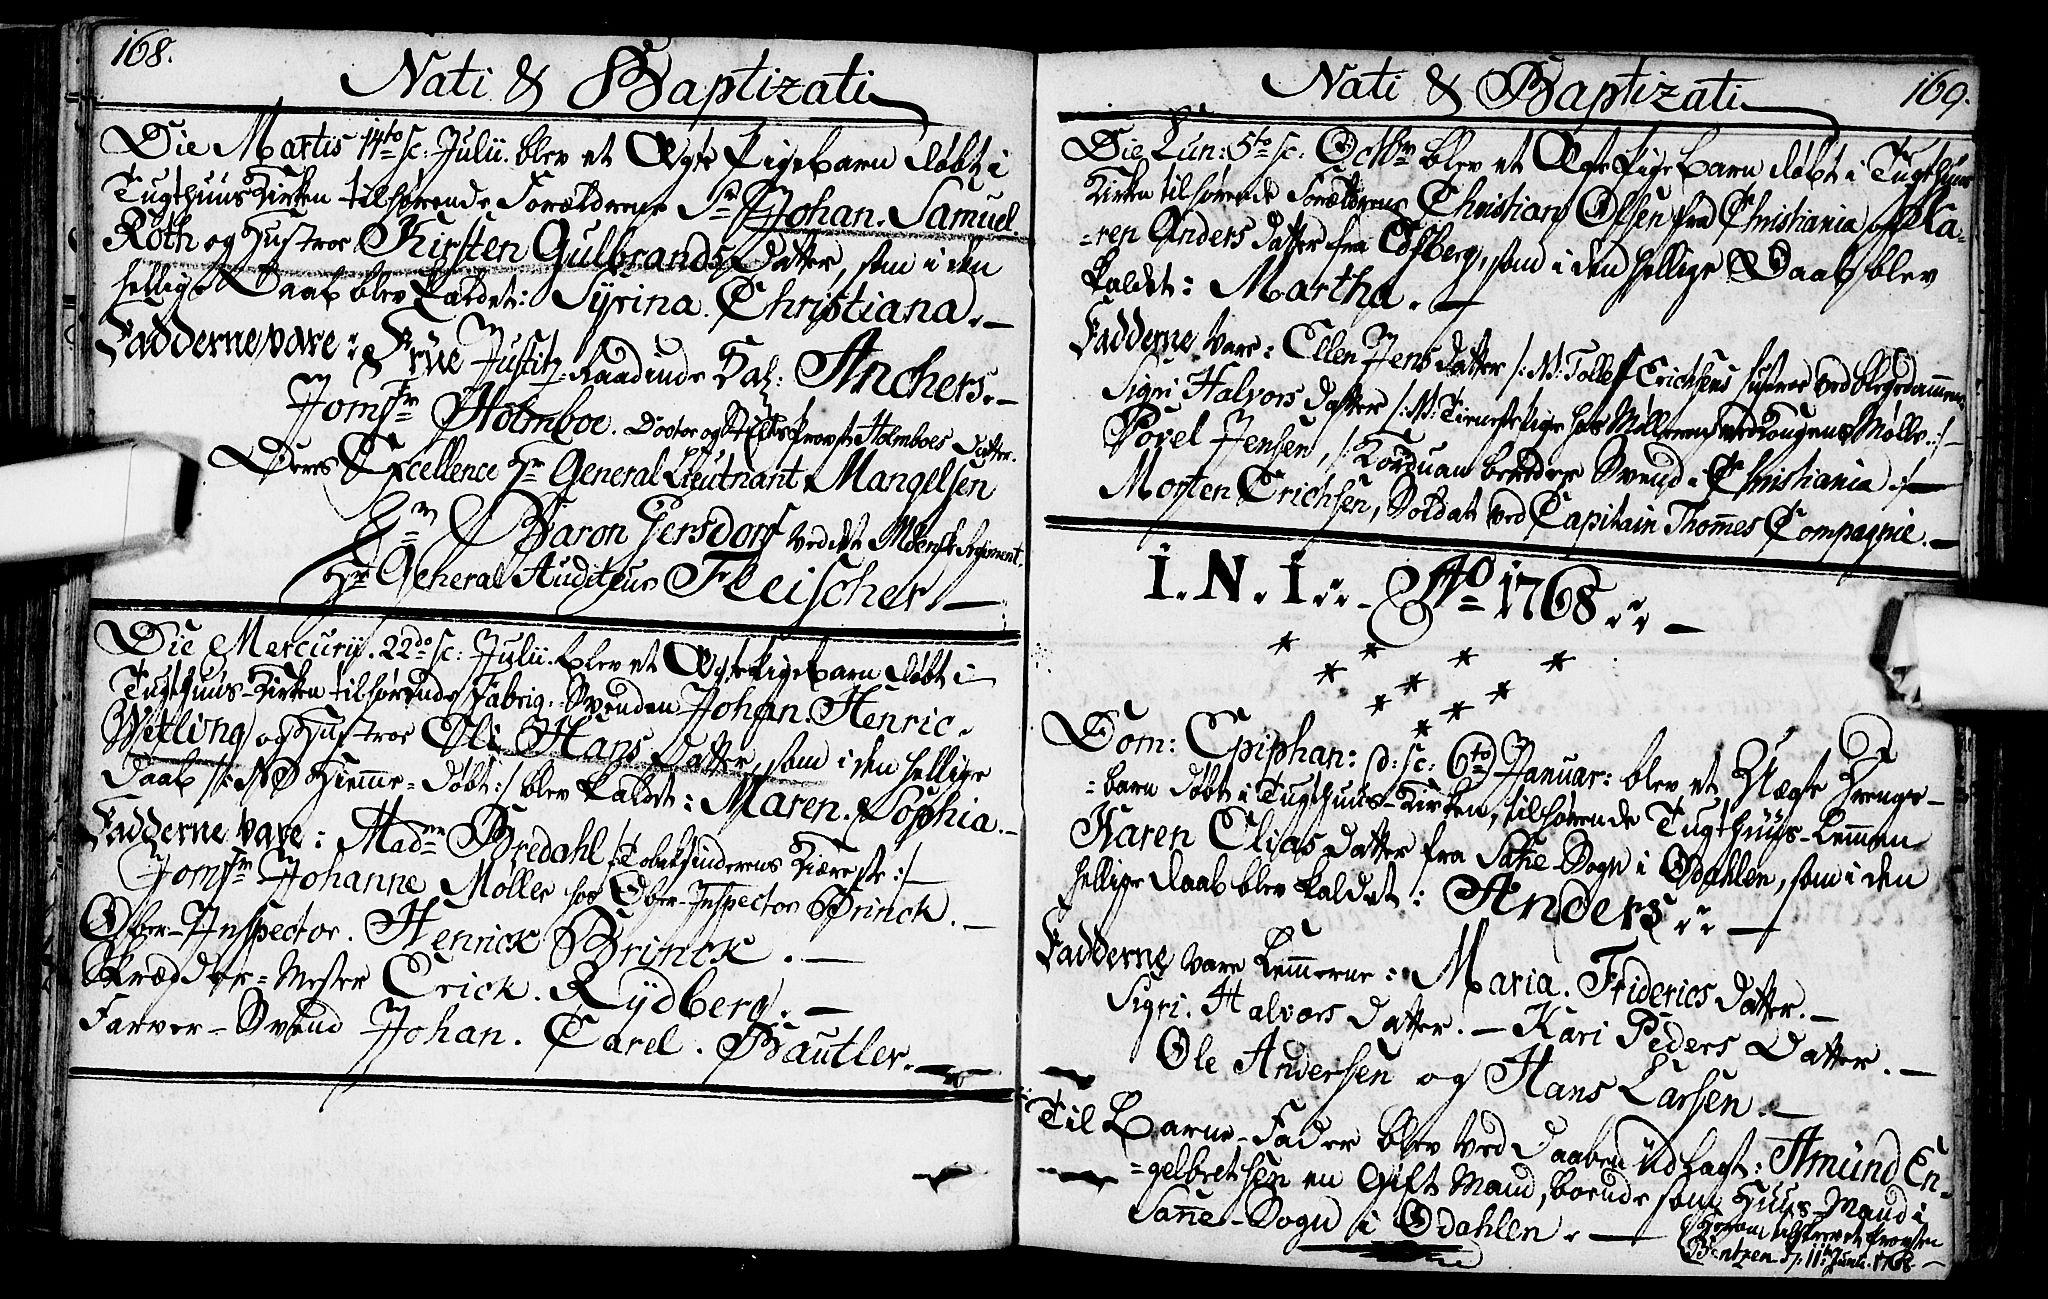 SAO, Kristiania tukthusprest Kirkebøker, F/Fa/L0001: Ministerialbok nr. 1, 1758-1828, s. 168-169